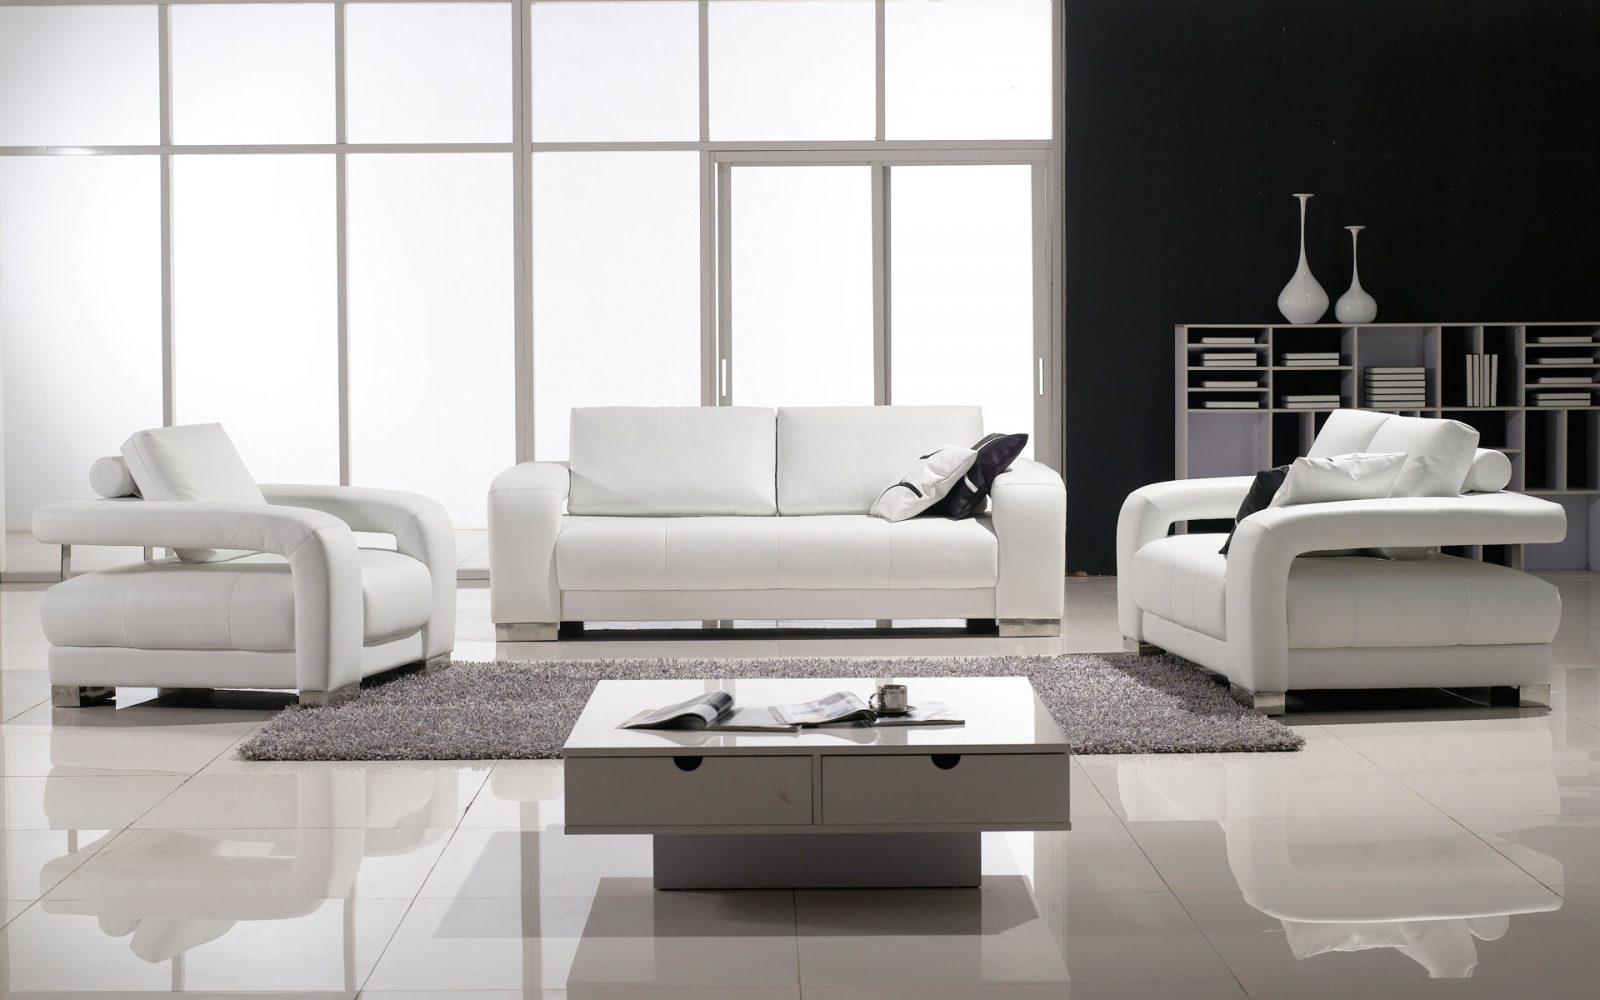 Sof s modernos for Sofas y sillones de diseno